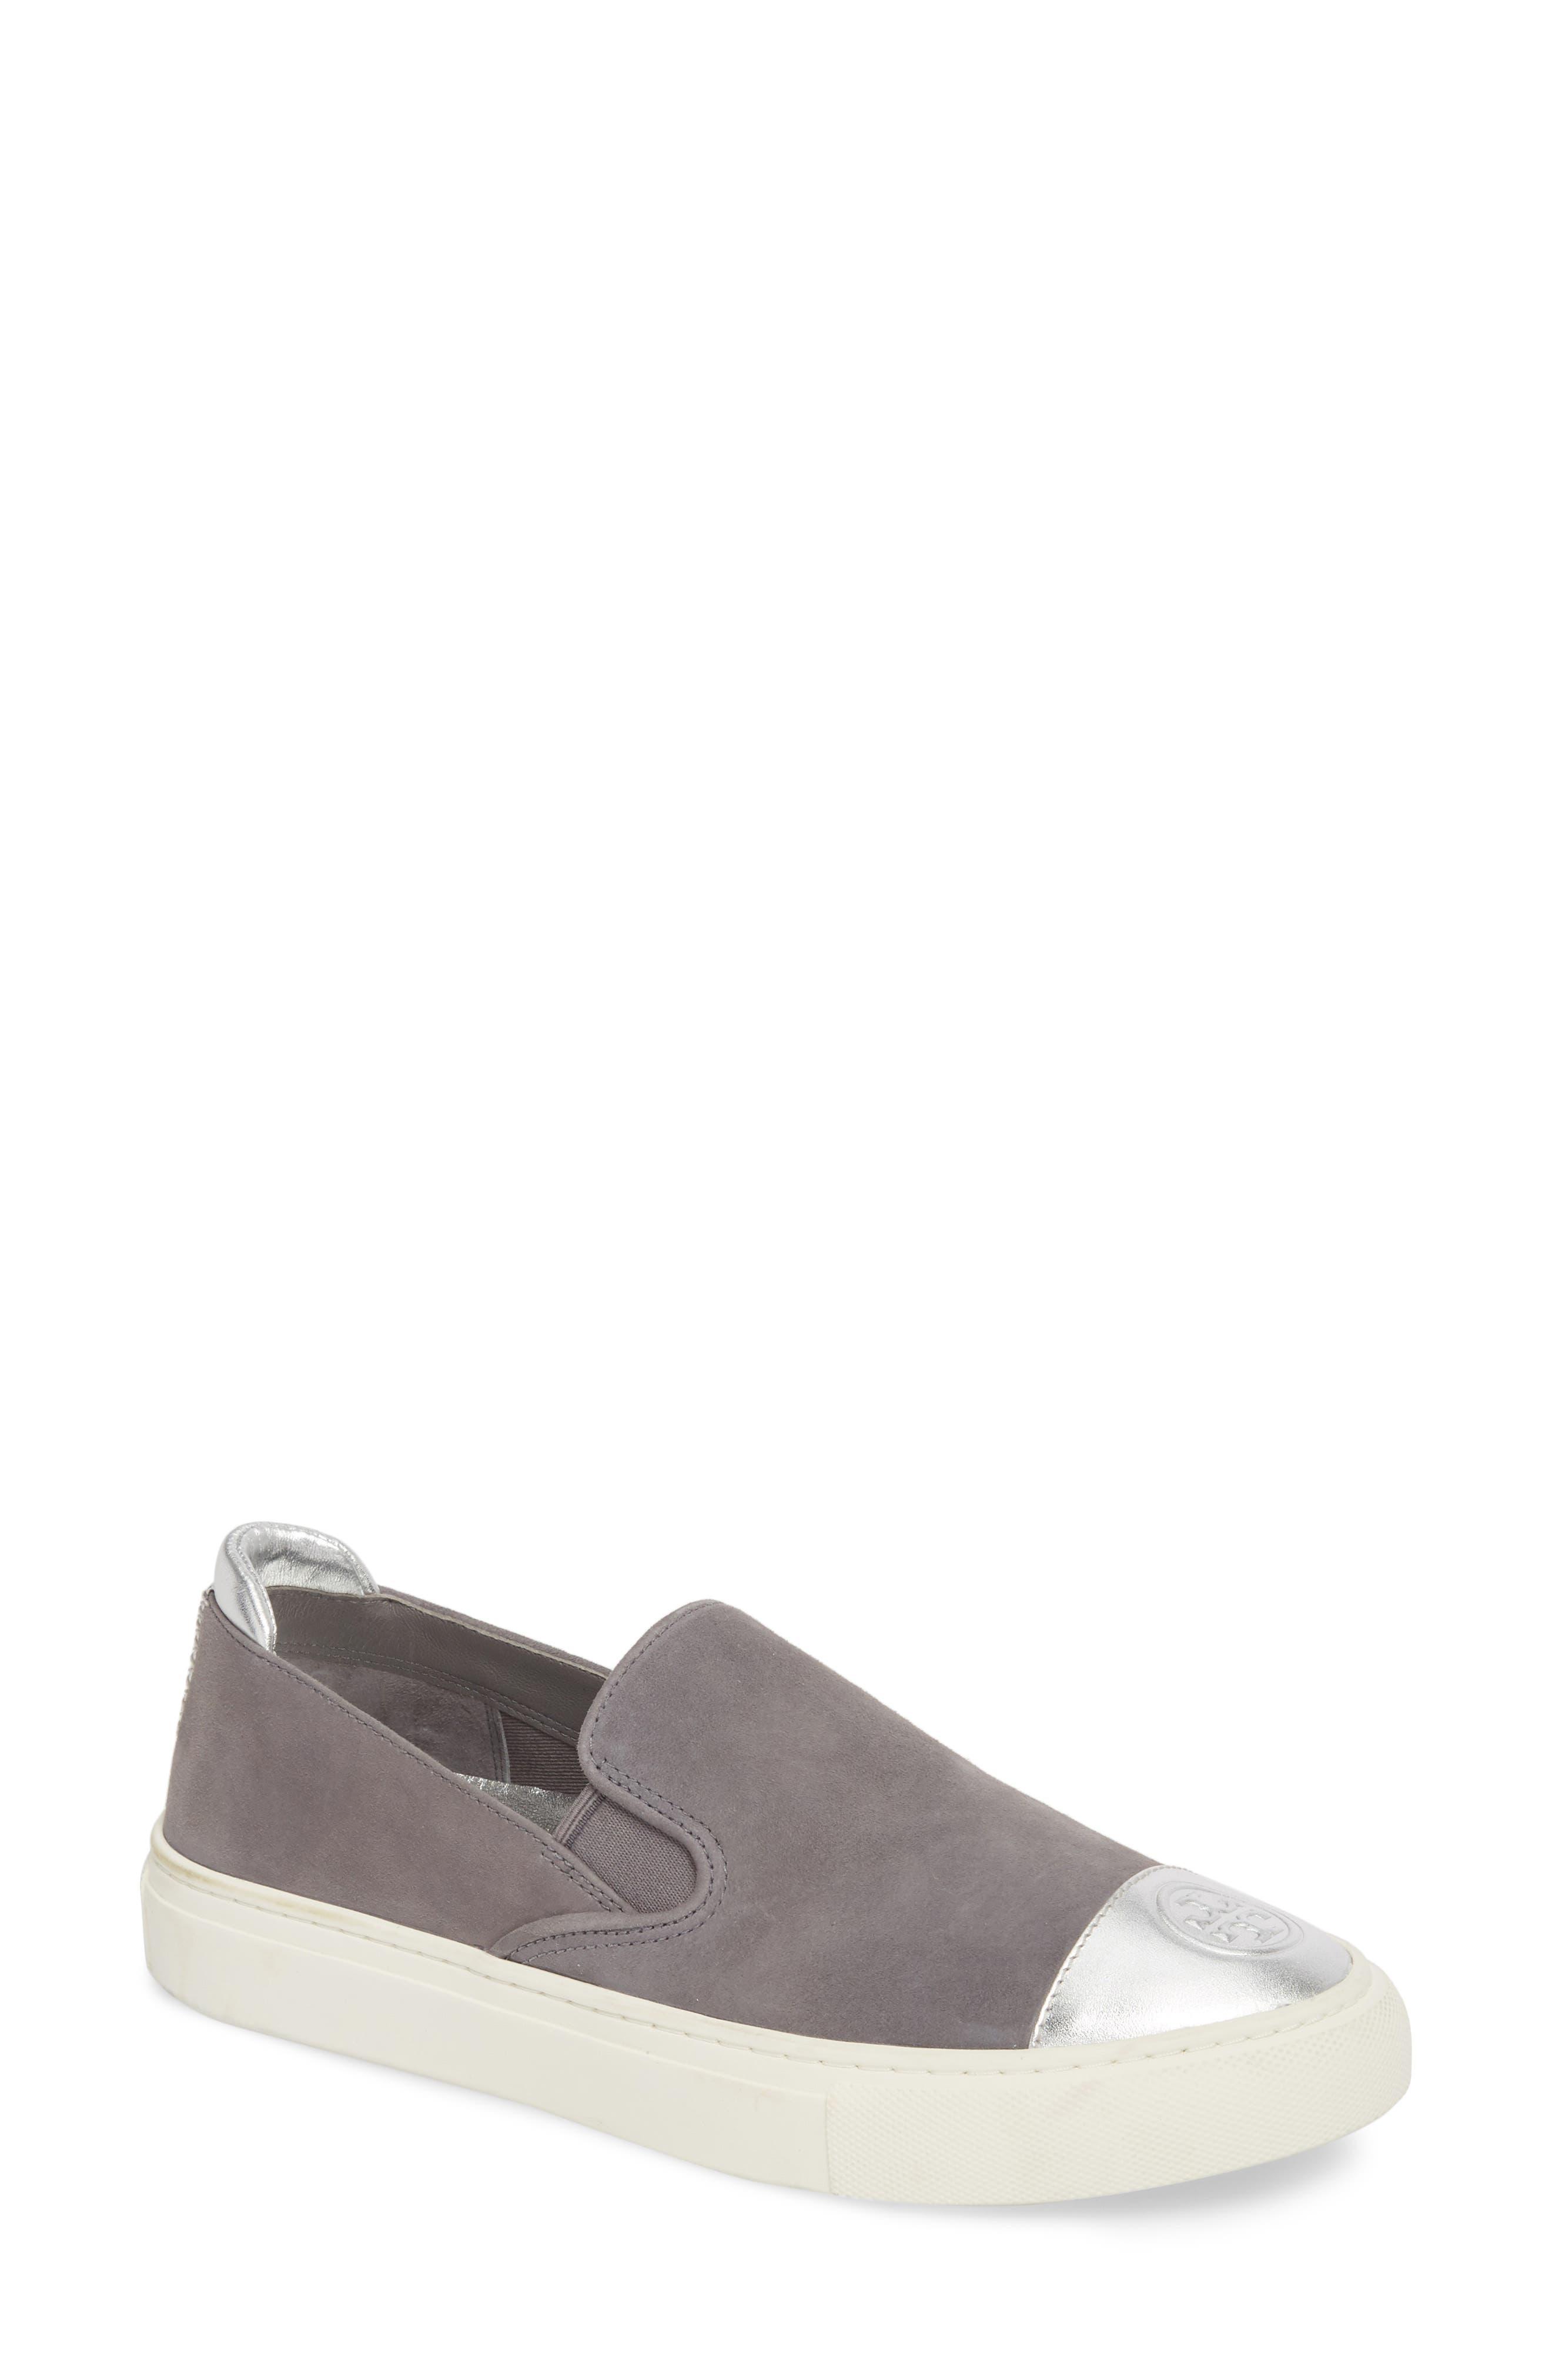 Colorblock Slip-On Sneaker,                         Main,                         color, CARBON/ SILVER